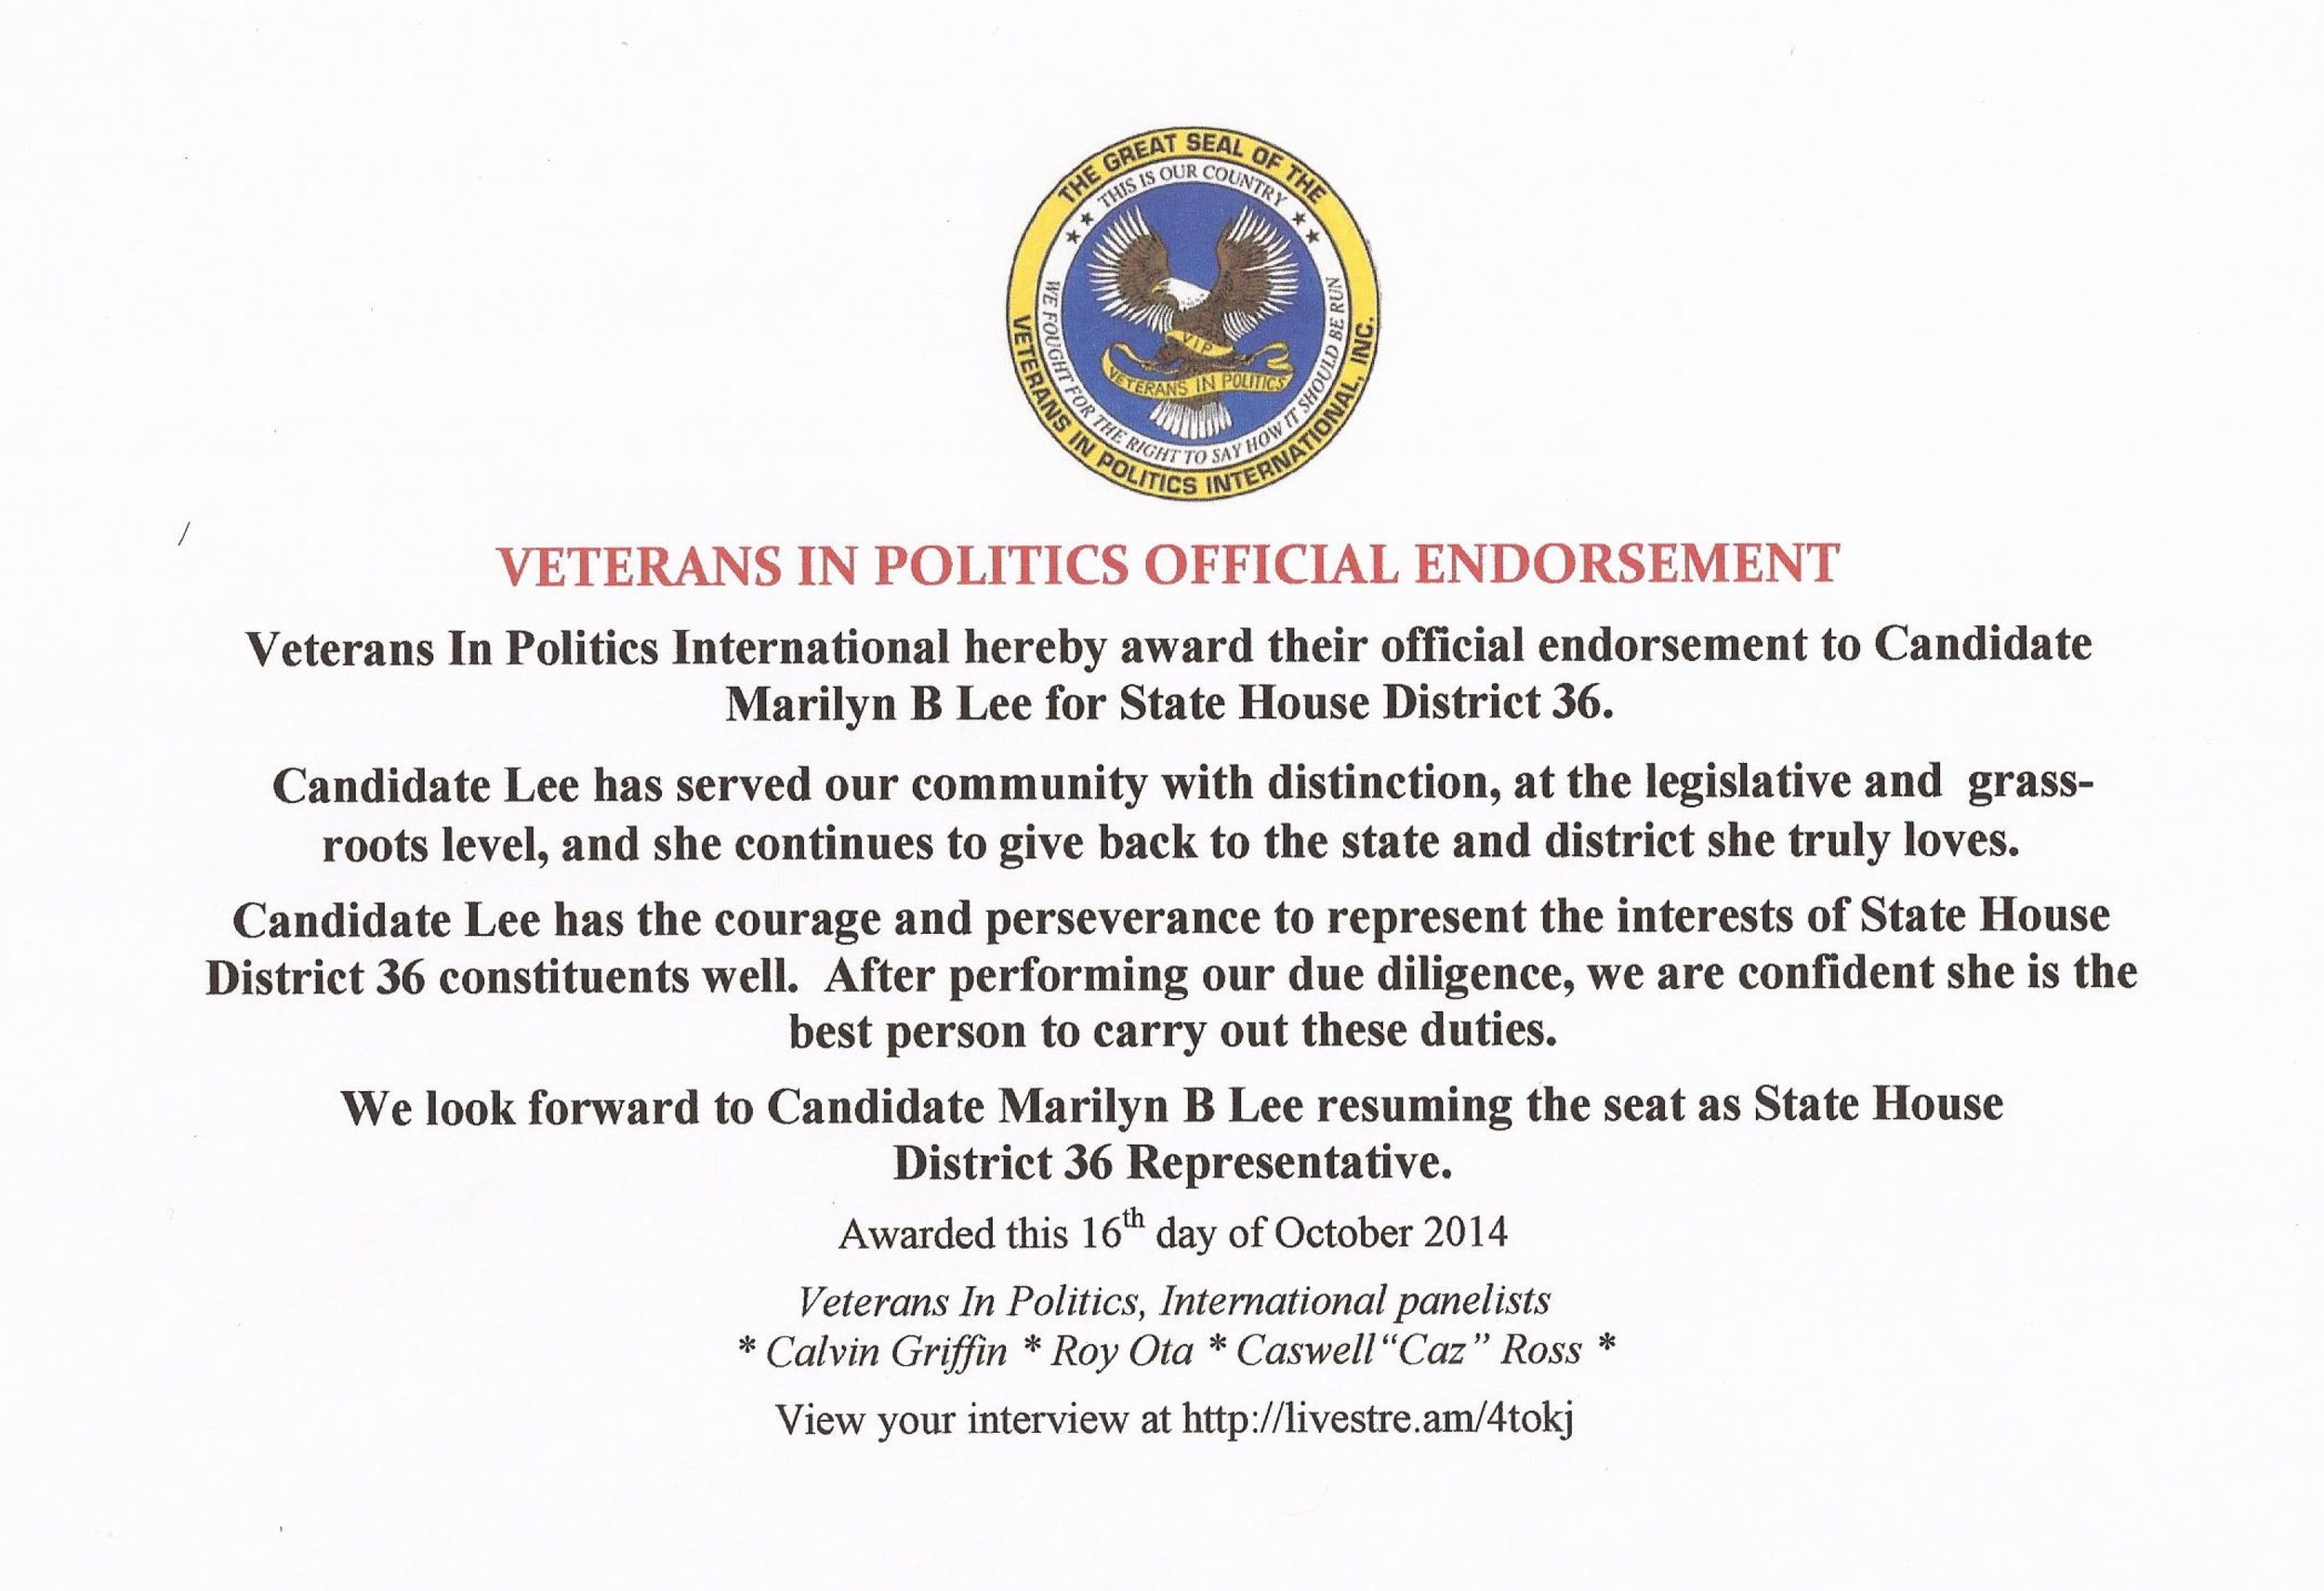 VIPI_EndorsementCertificate.jpg